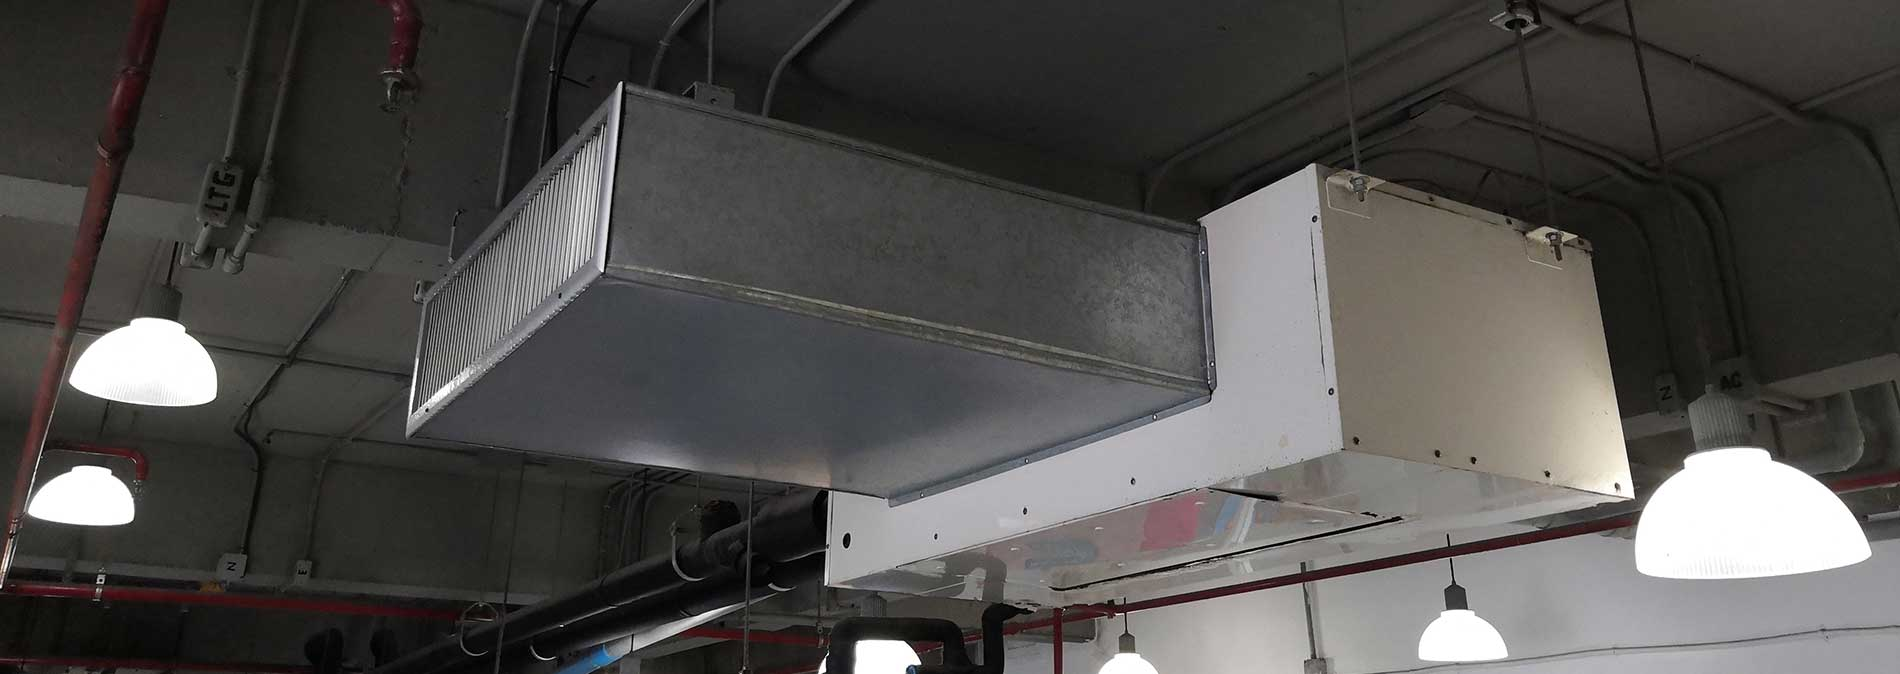 Mechanical Air Handling